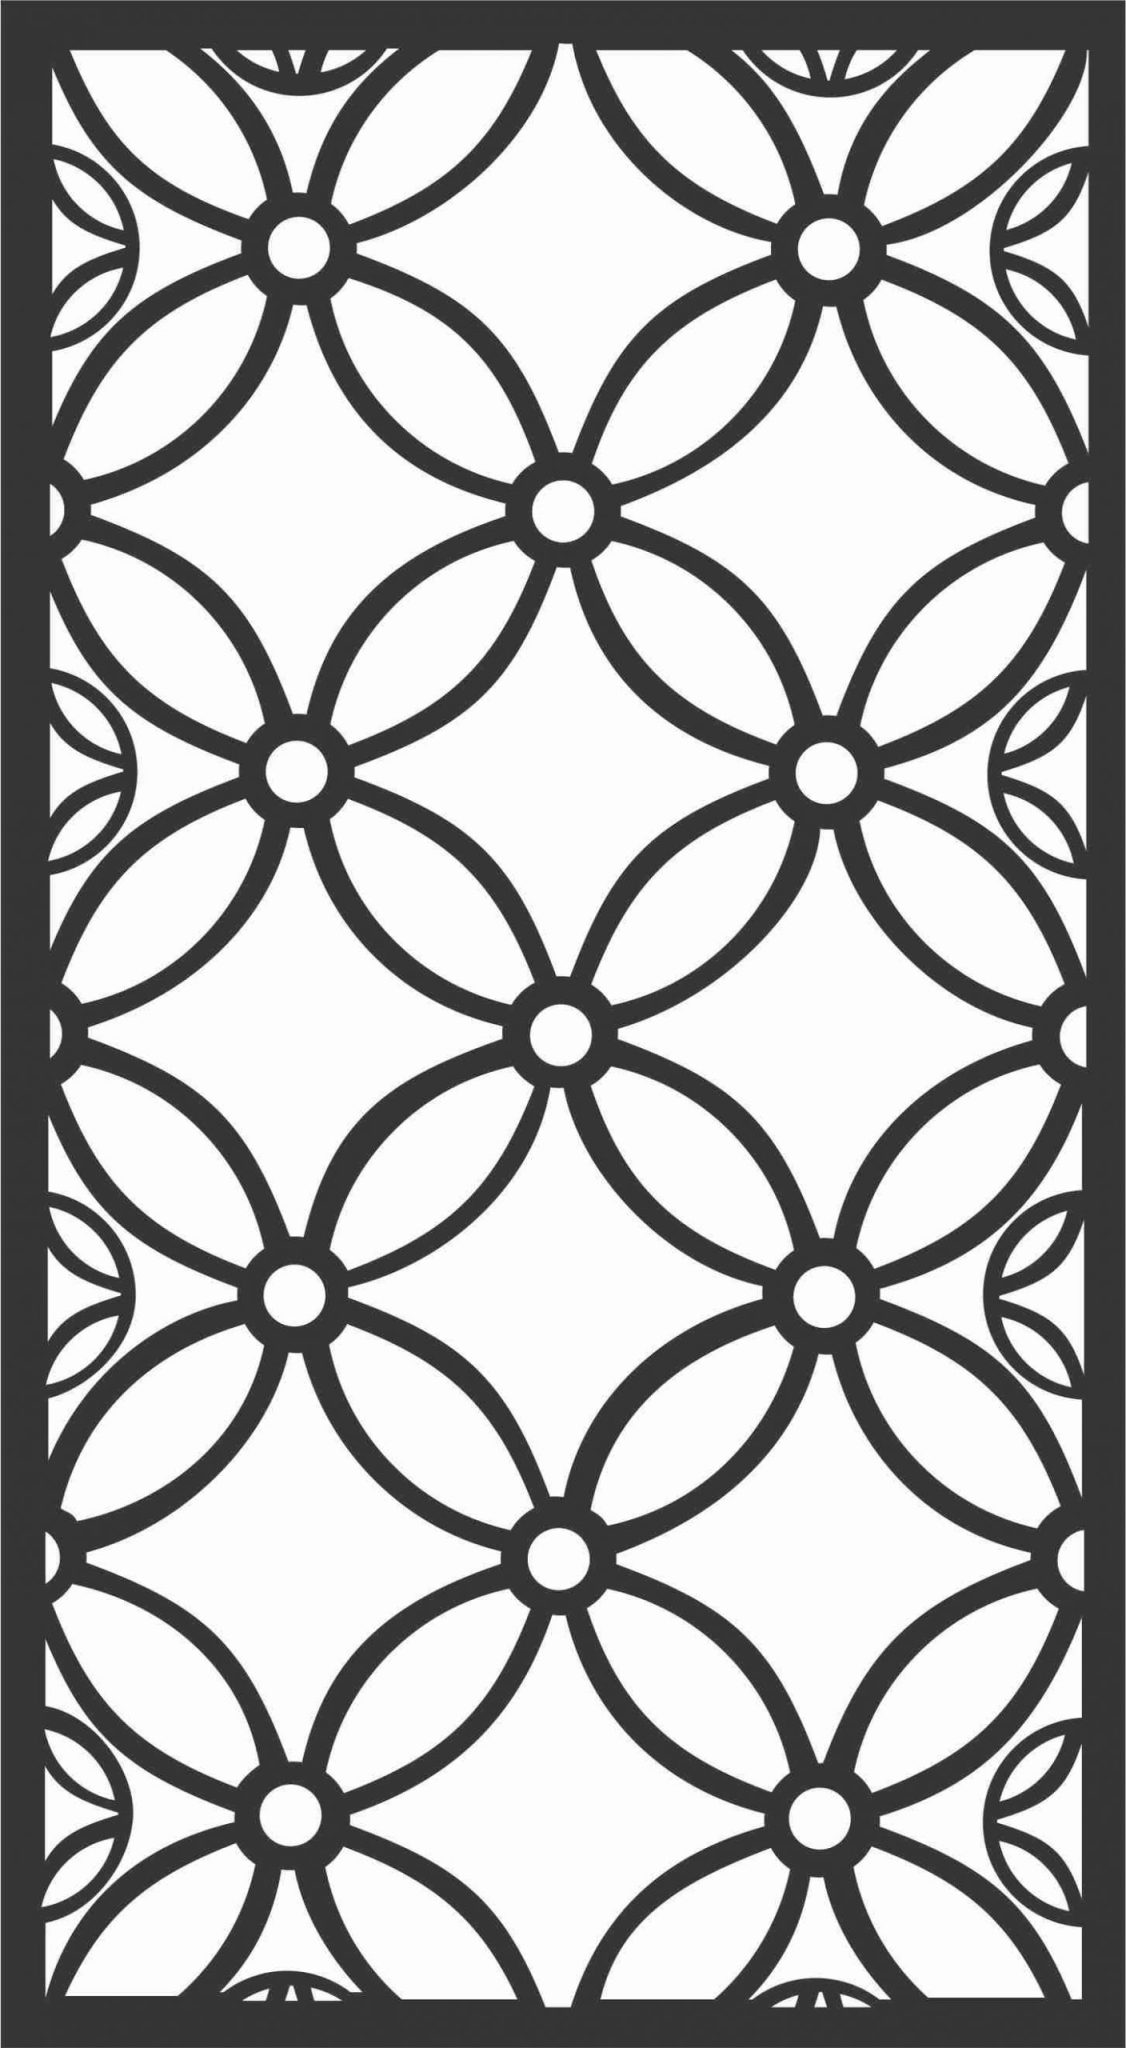 Screen Panel Patterns Seamless 25 Free DXF File